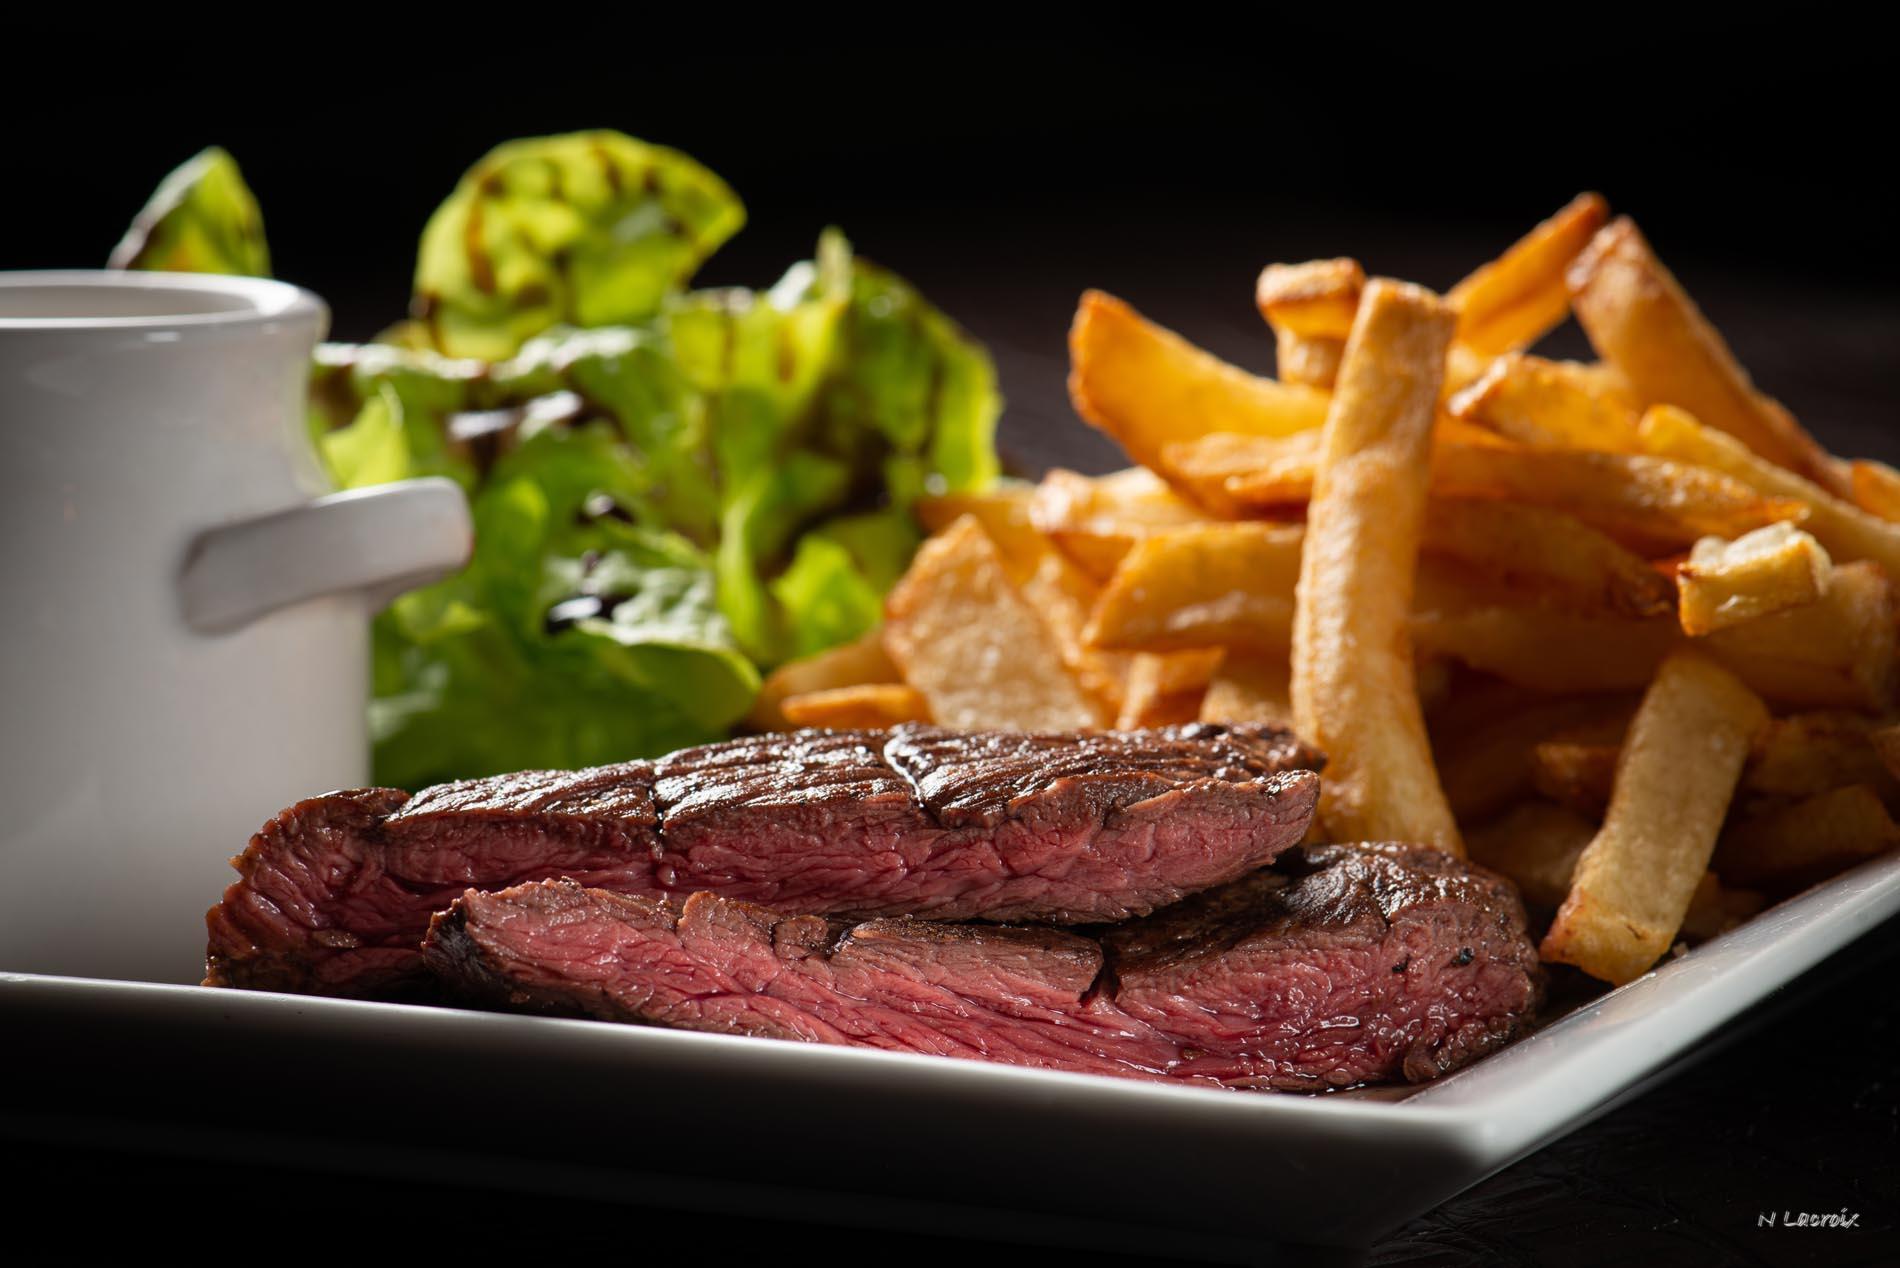 Entreprise; Isere; Photo; Photographe; Reportage; Rhone; Vienne; culinaire; restaurant; tartine; burger